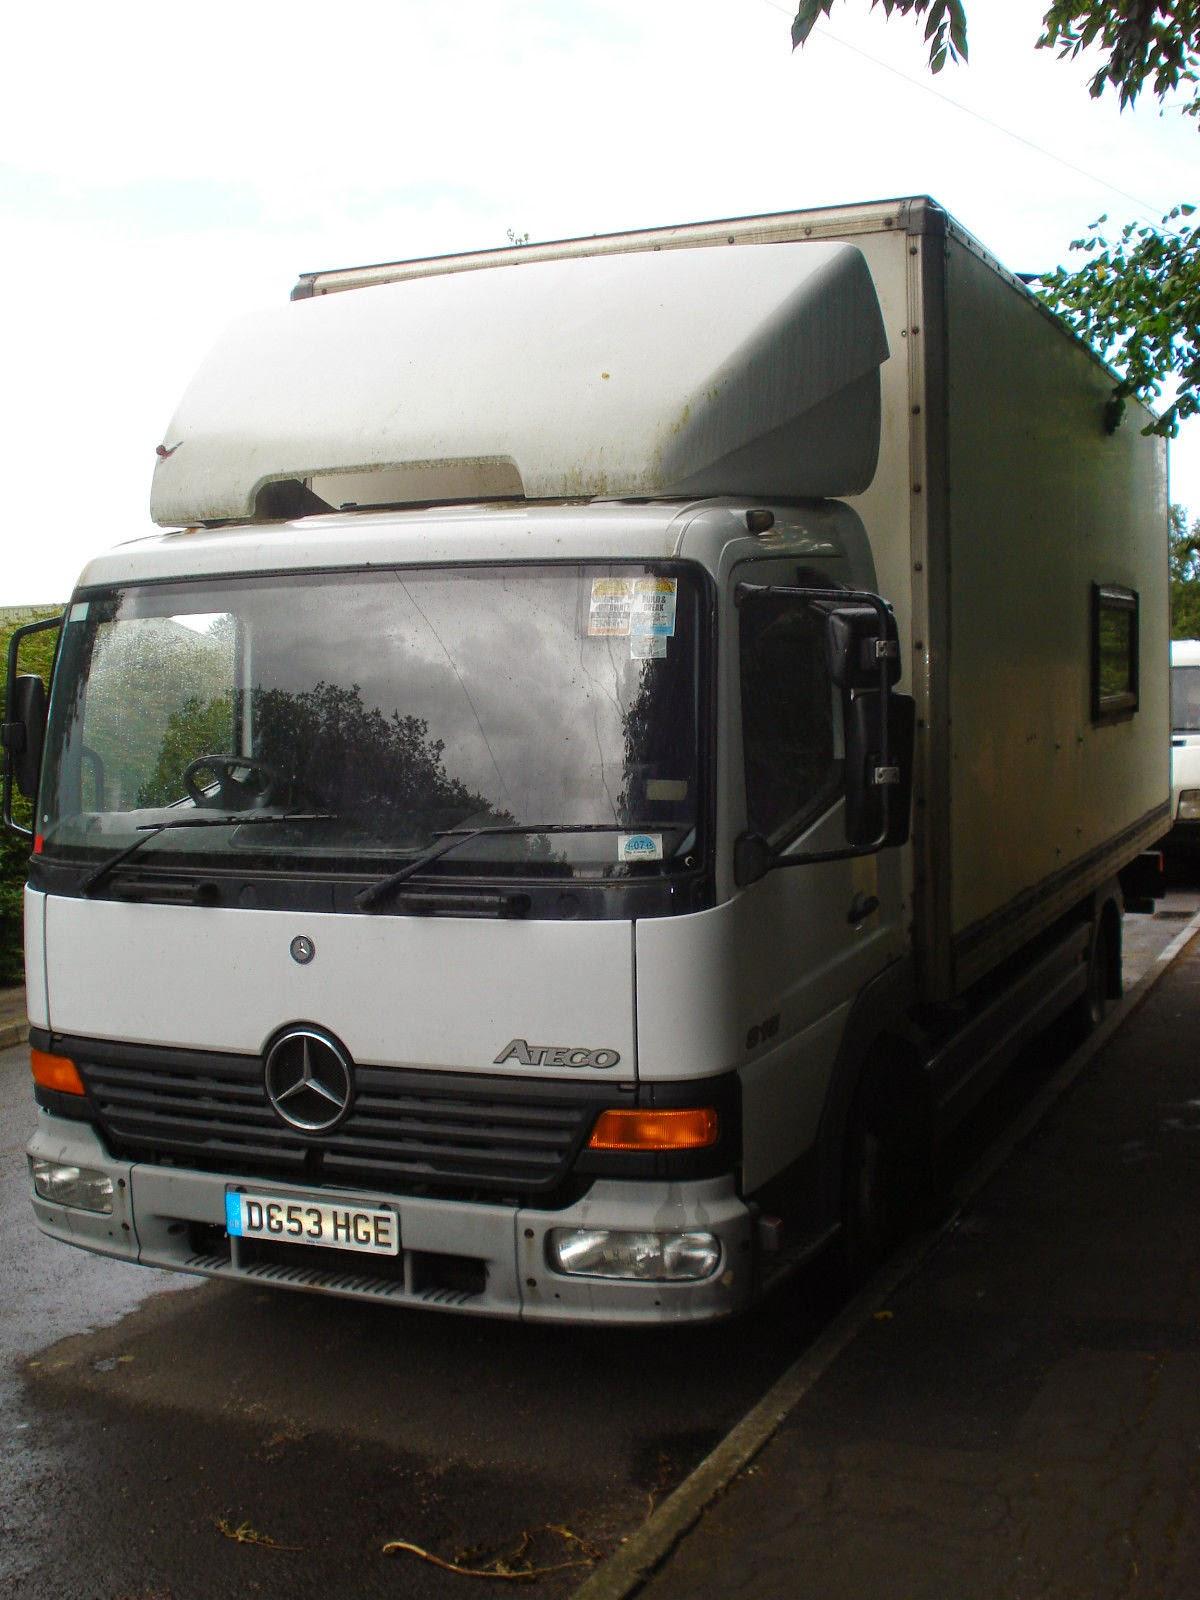 My Red Van: Mercedes Box Van 'Camper'